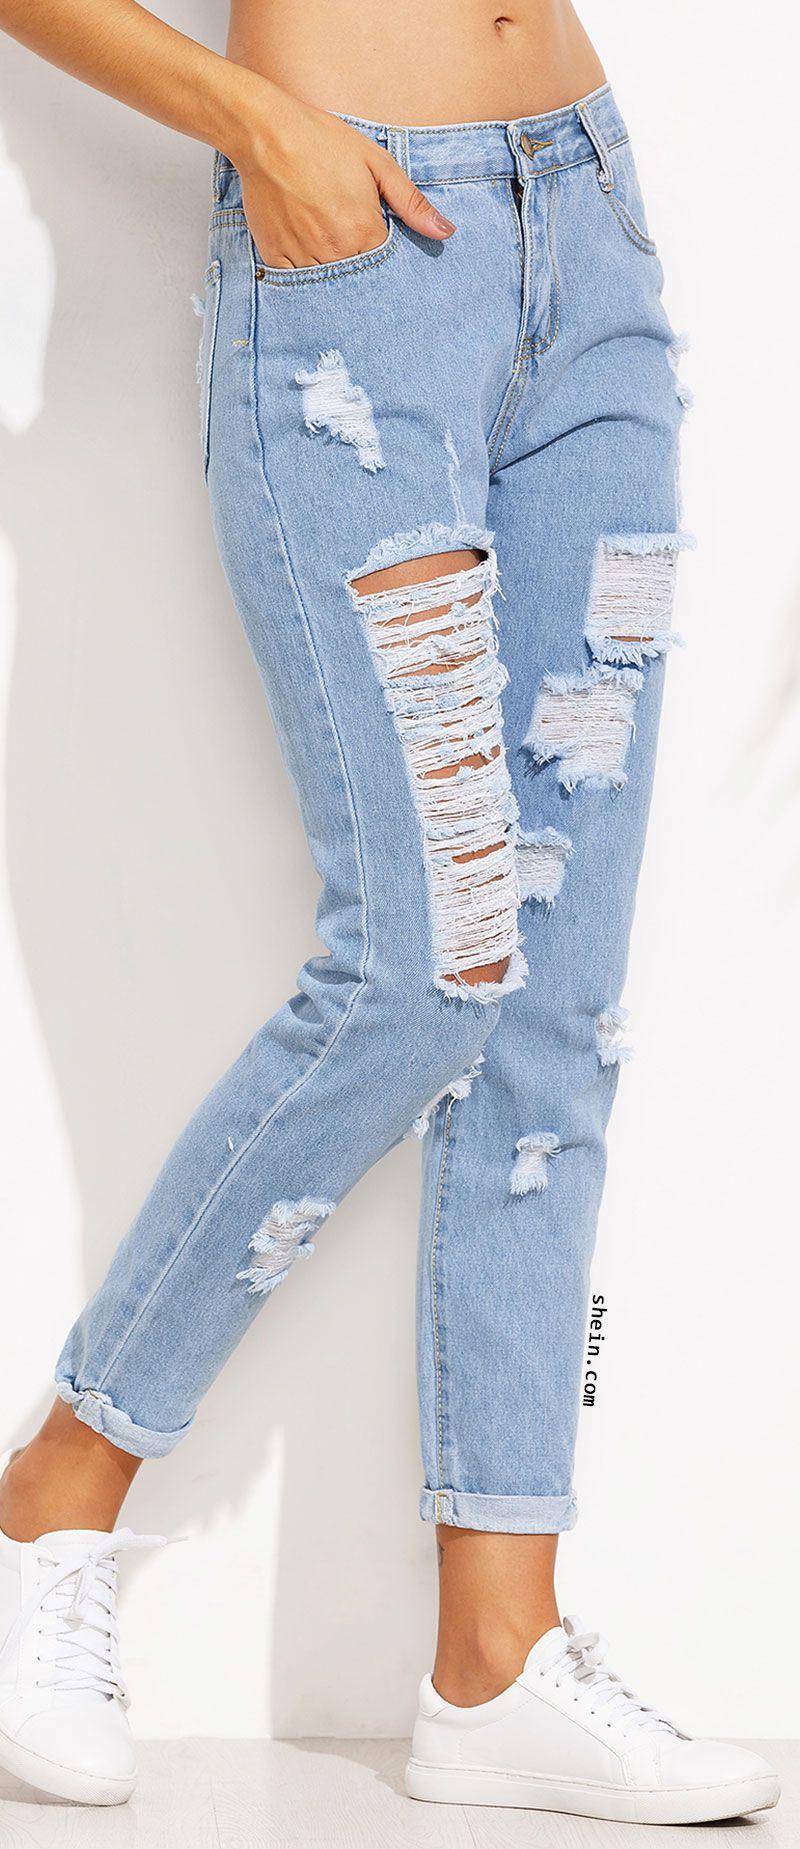 Extreme Distressed Roll Hem Boyfriend Jeans Cute Ripped Jeans Ripped Jeans Outfit Cute Casual Outfits